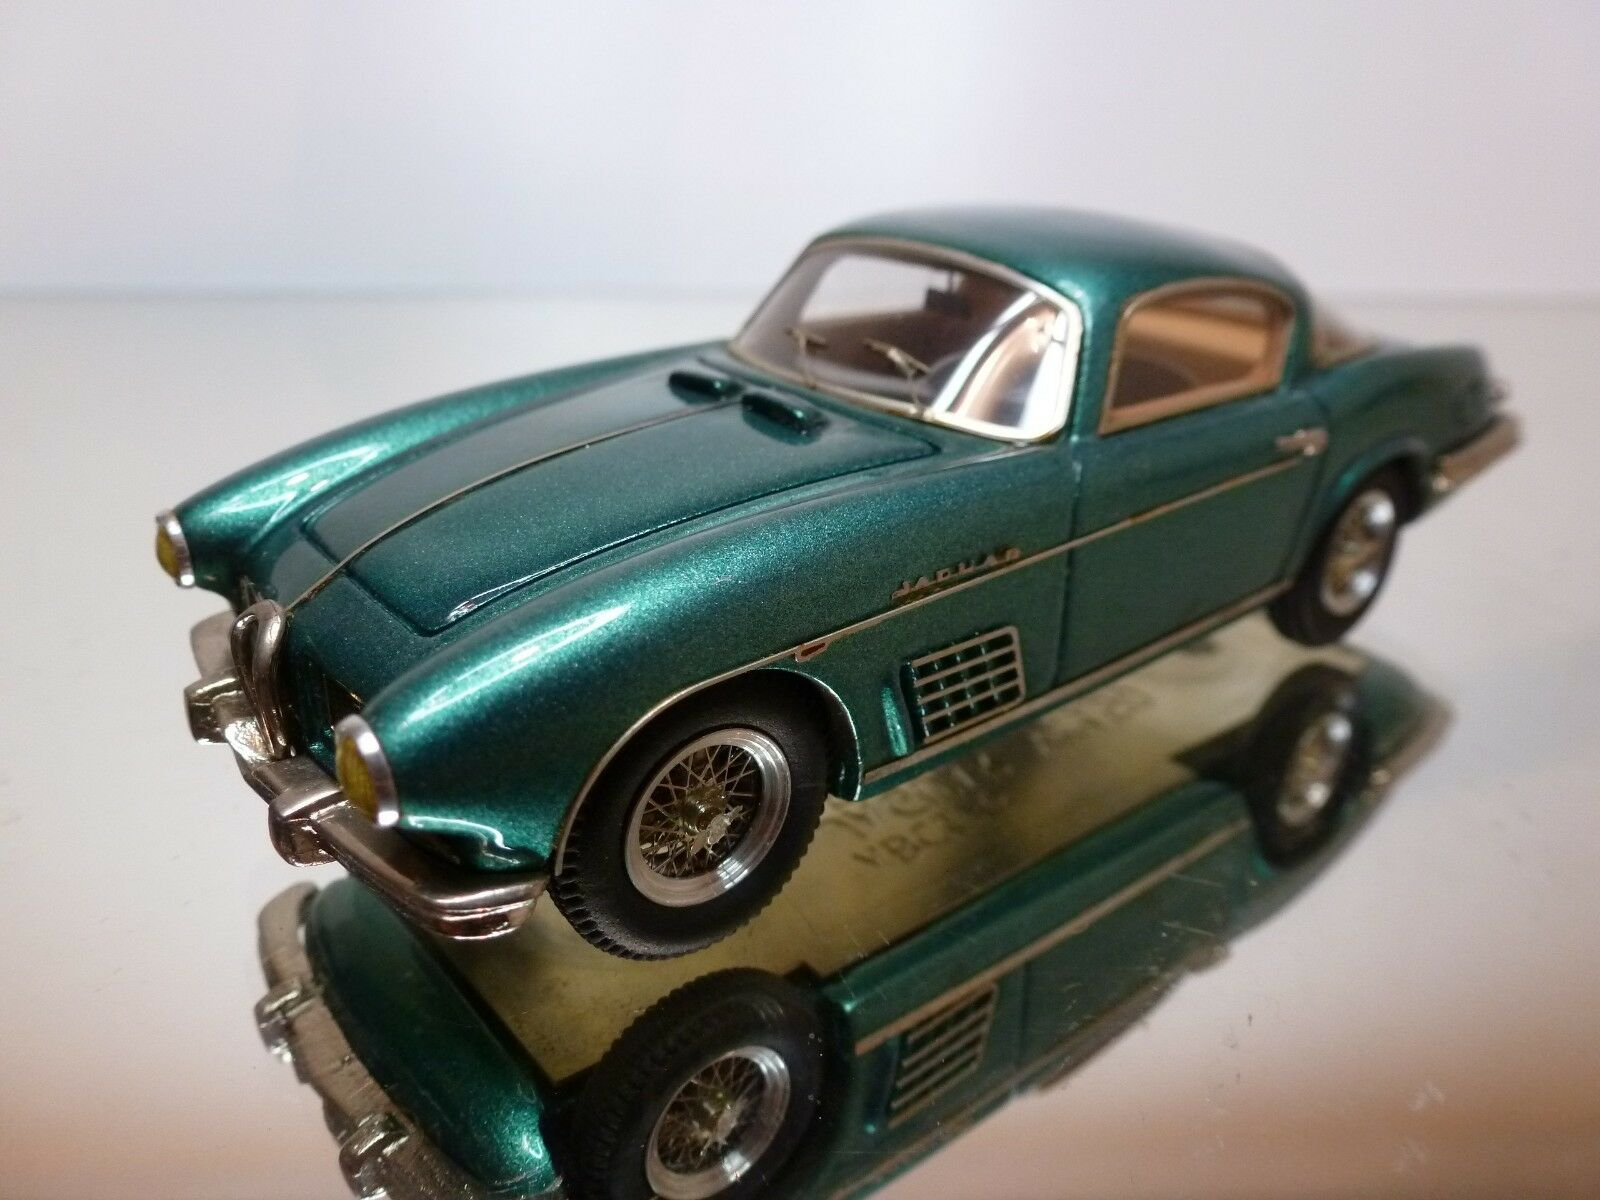 Abc176 jaguar xk150 bertone 1958 - grün   blau metallic 1 43 - vorzüglich - 15.